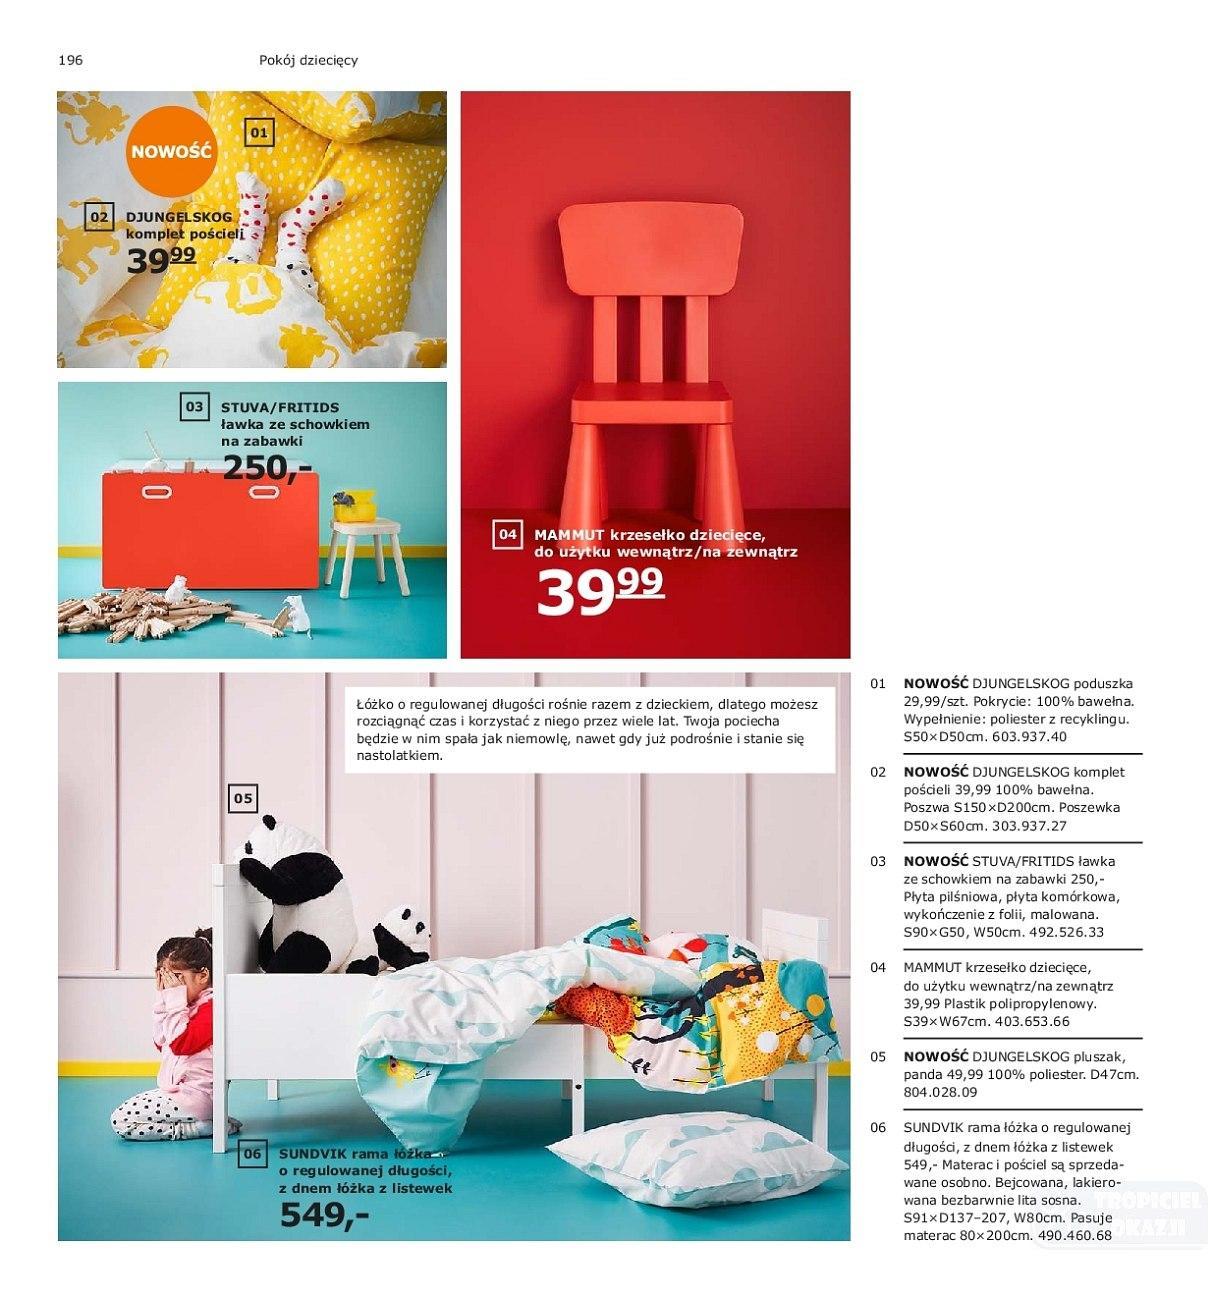 gazetka promocyjna i reklamowa ikea katalog 2019 od 17 08 2018 do 31 07 2019. Black Bedroom Furniture Sets. Home Design Ideas